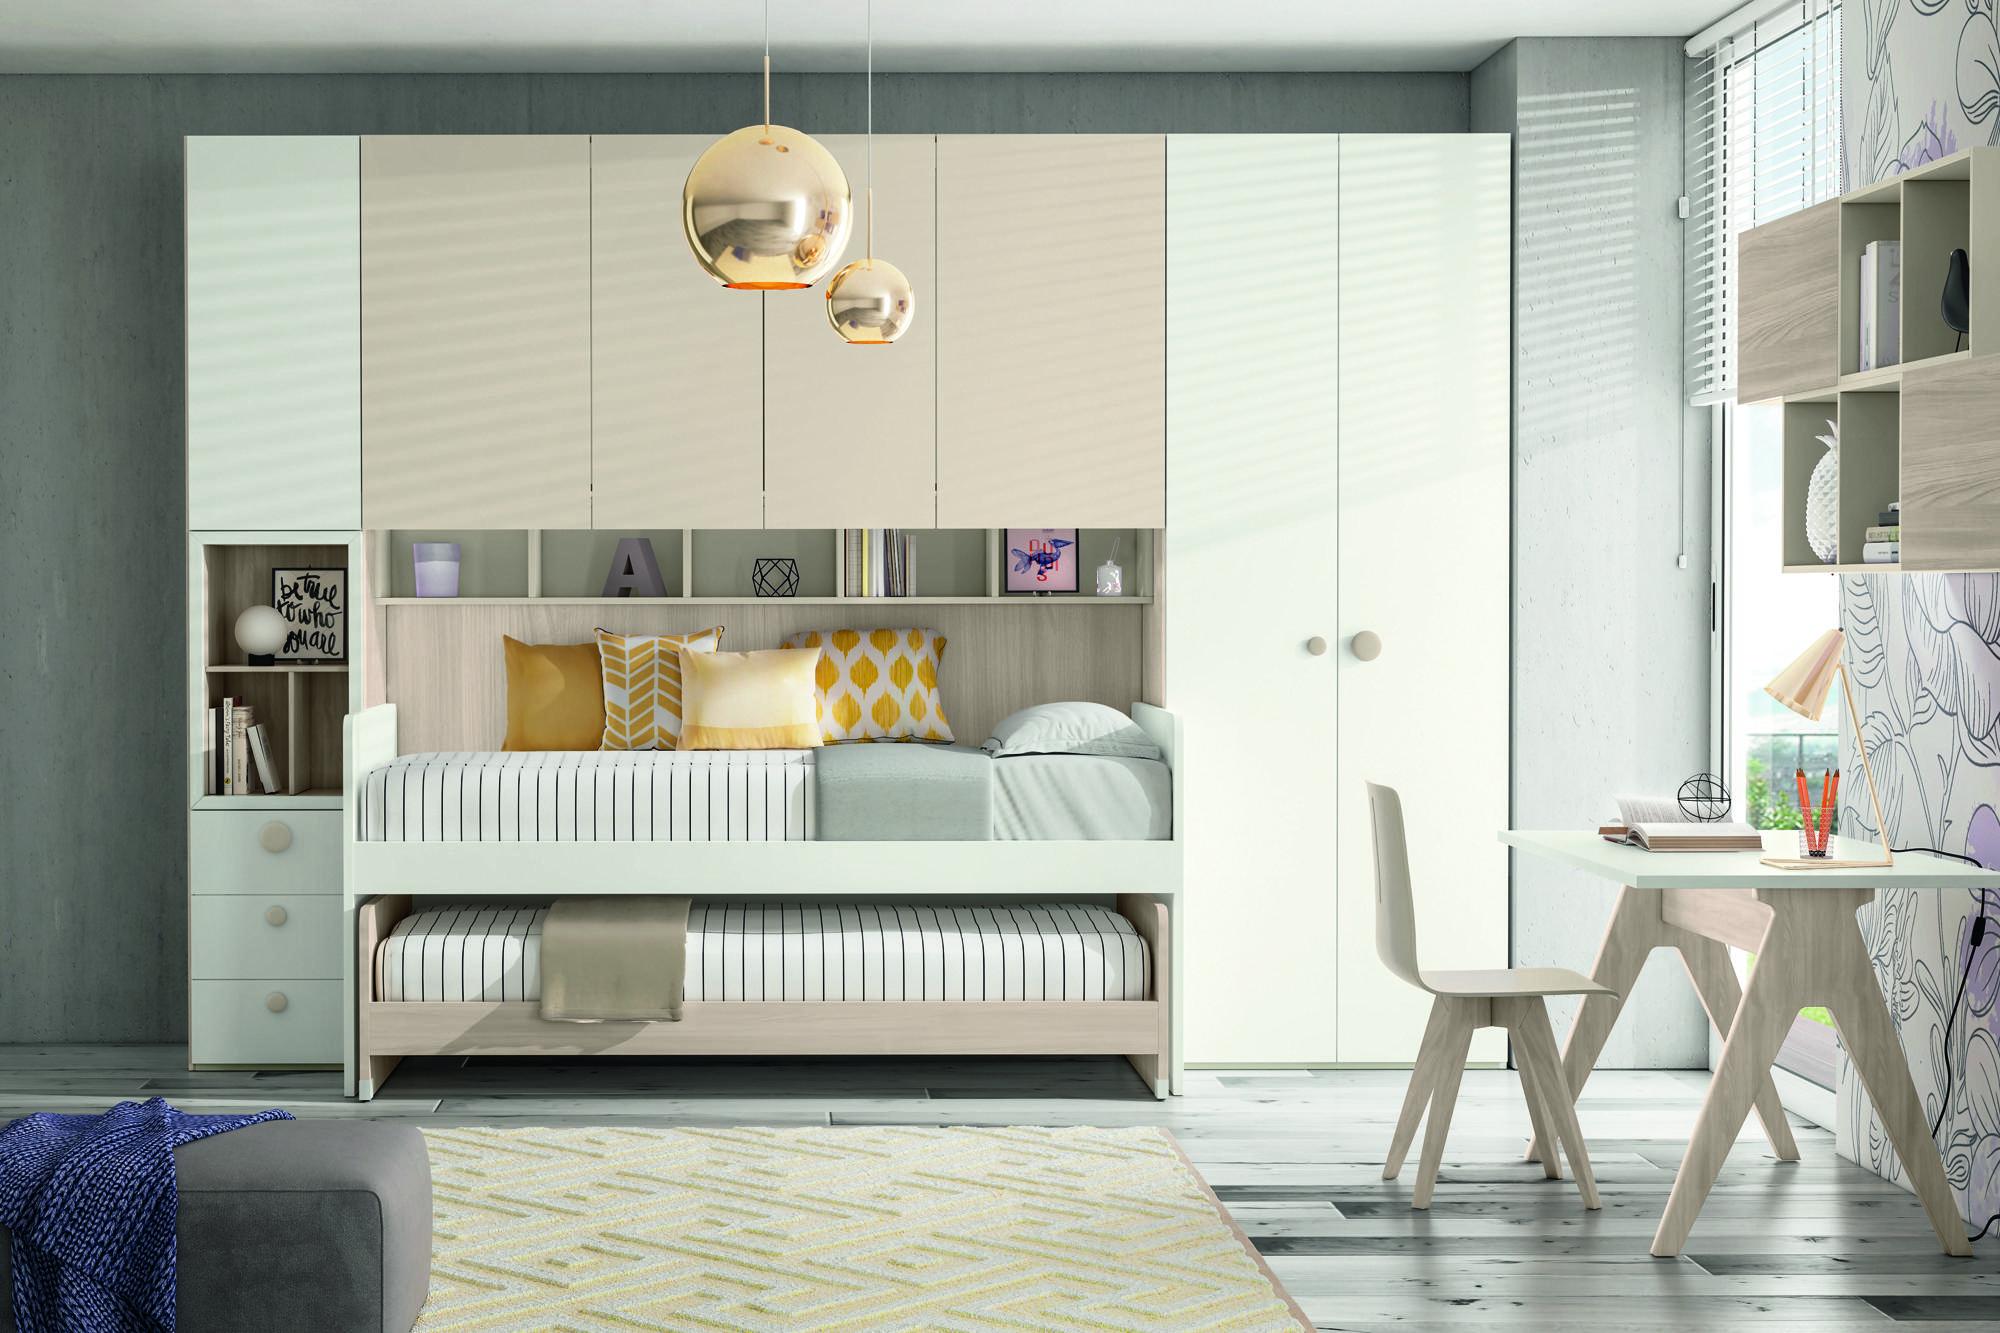 Vendita mobili online - cameretta componibile moderna ...